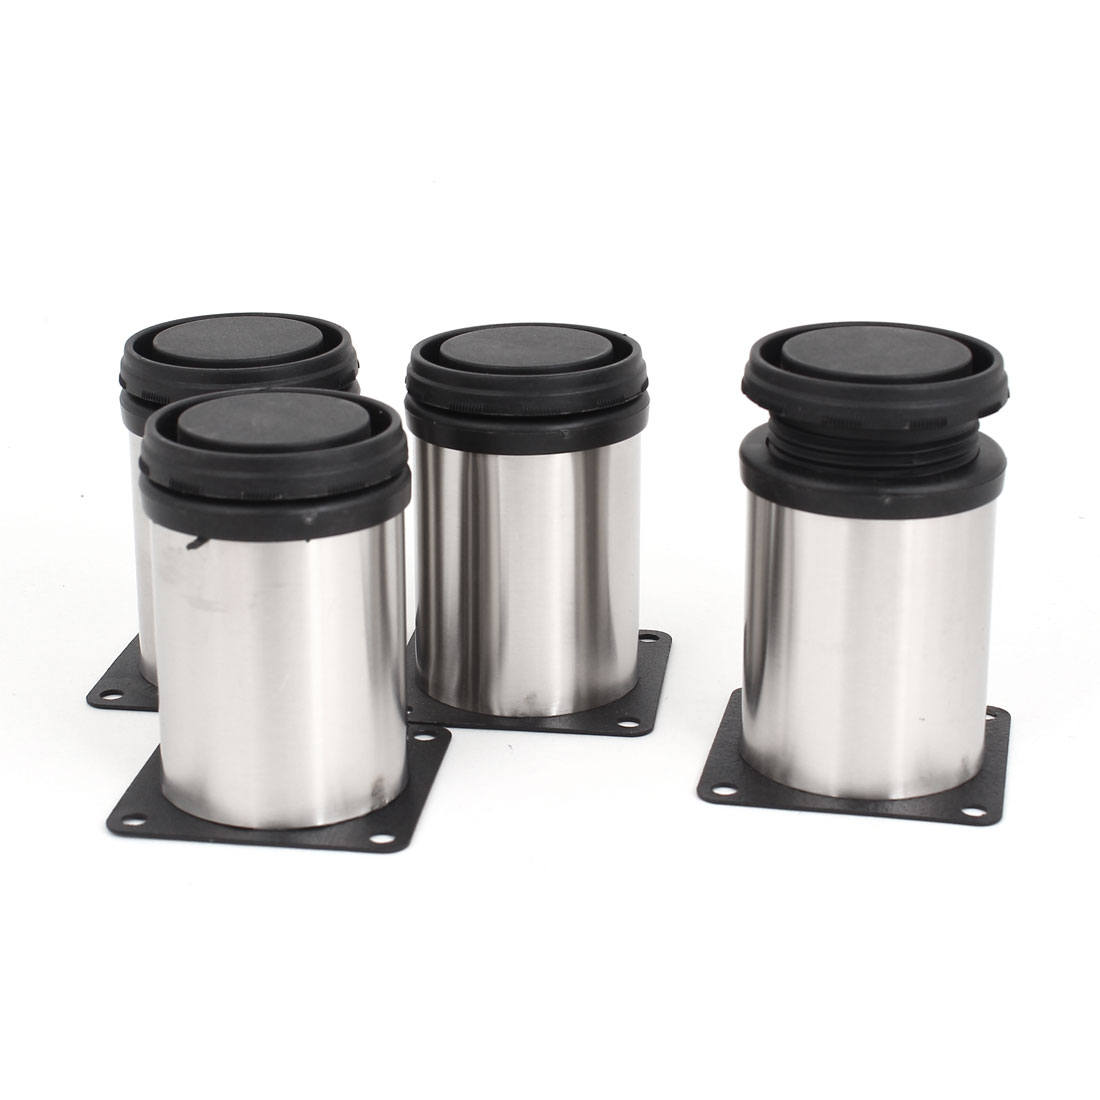 4pcs 80mm x 50mm Adjustable Plinth Leg Feet for Kitchen Cabinet Furniture Sofa